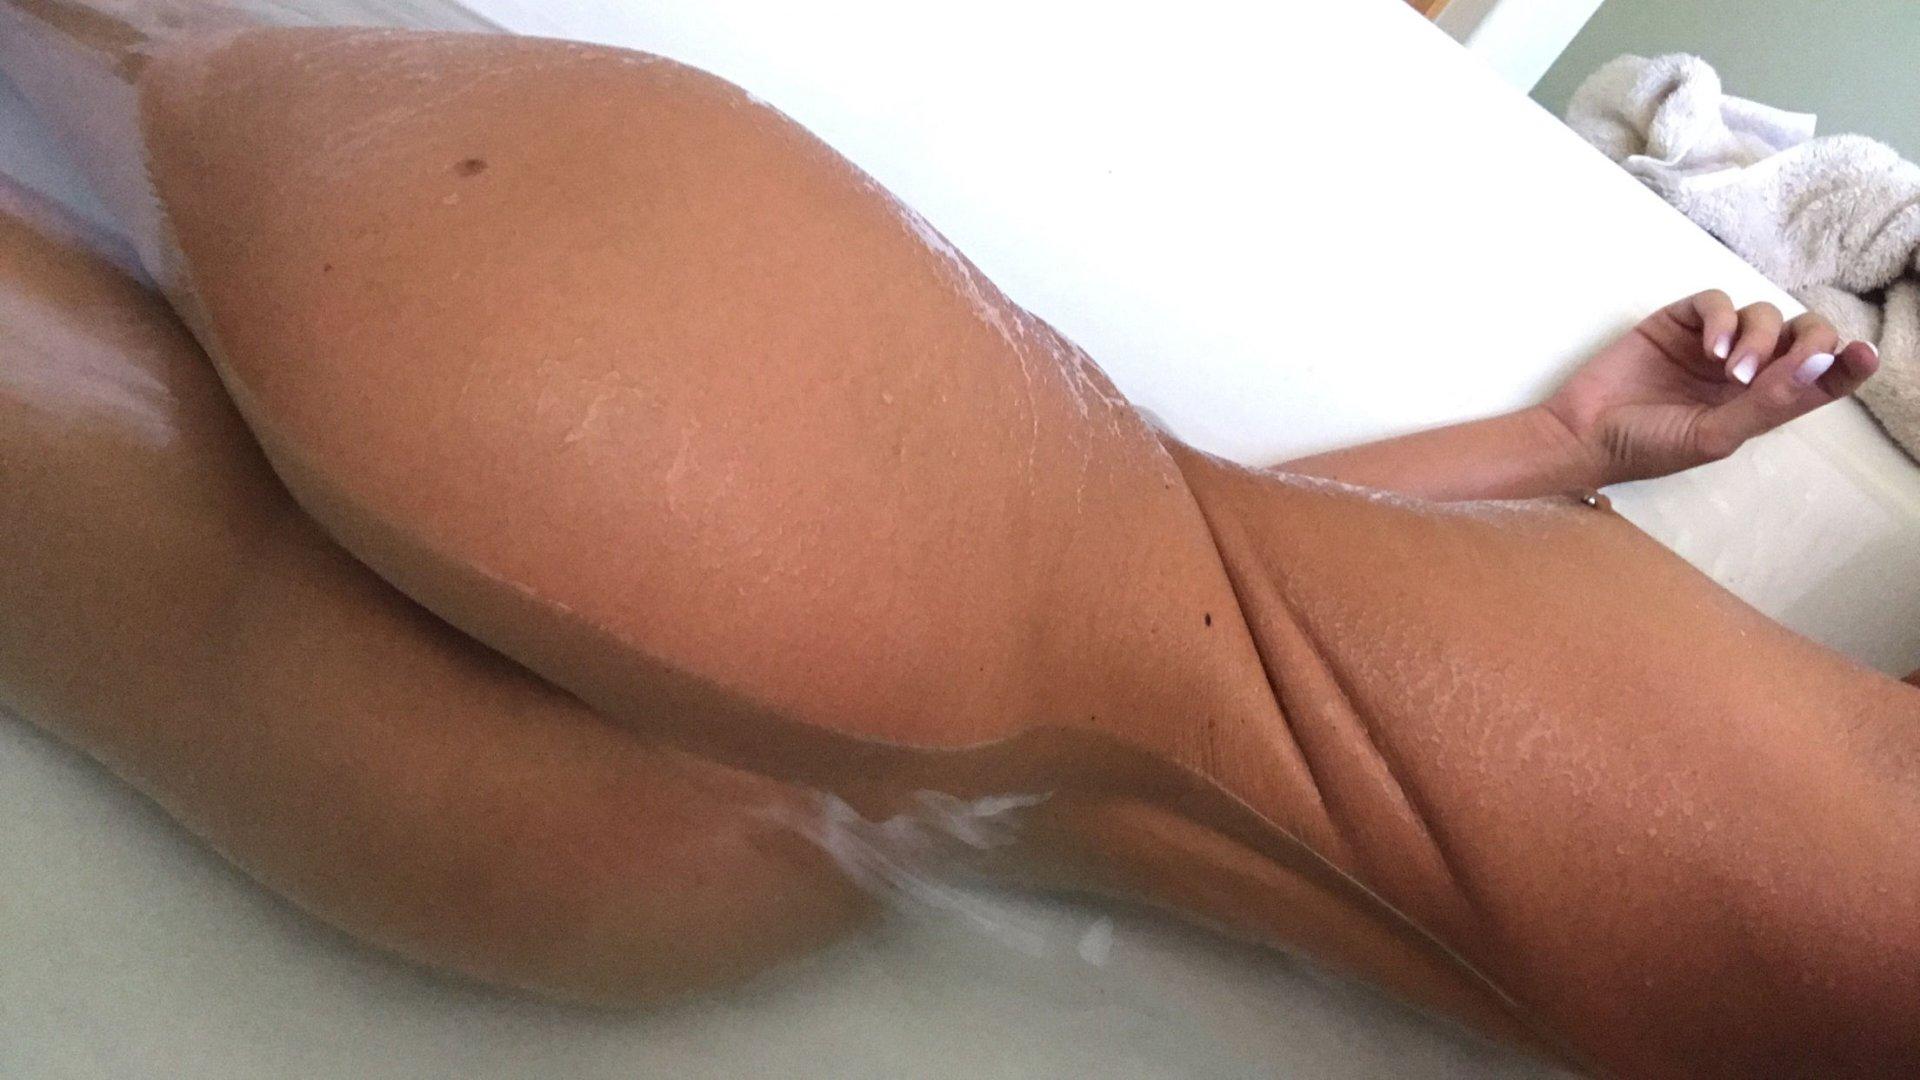 Cameron-Canela-Naked-TheFappeningBlog.com-26.jpg